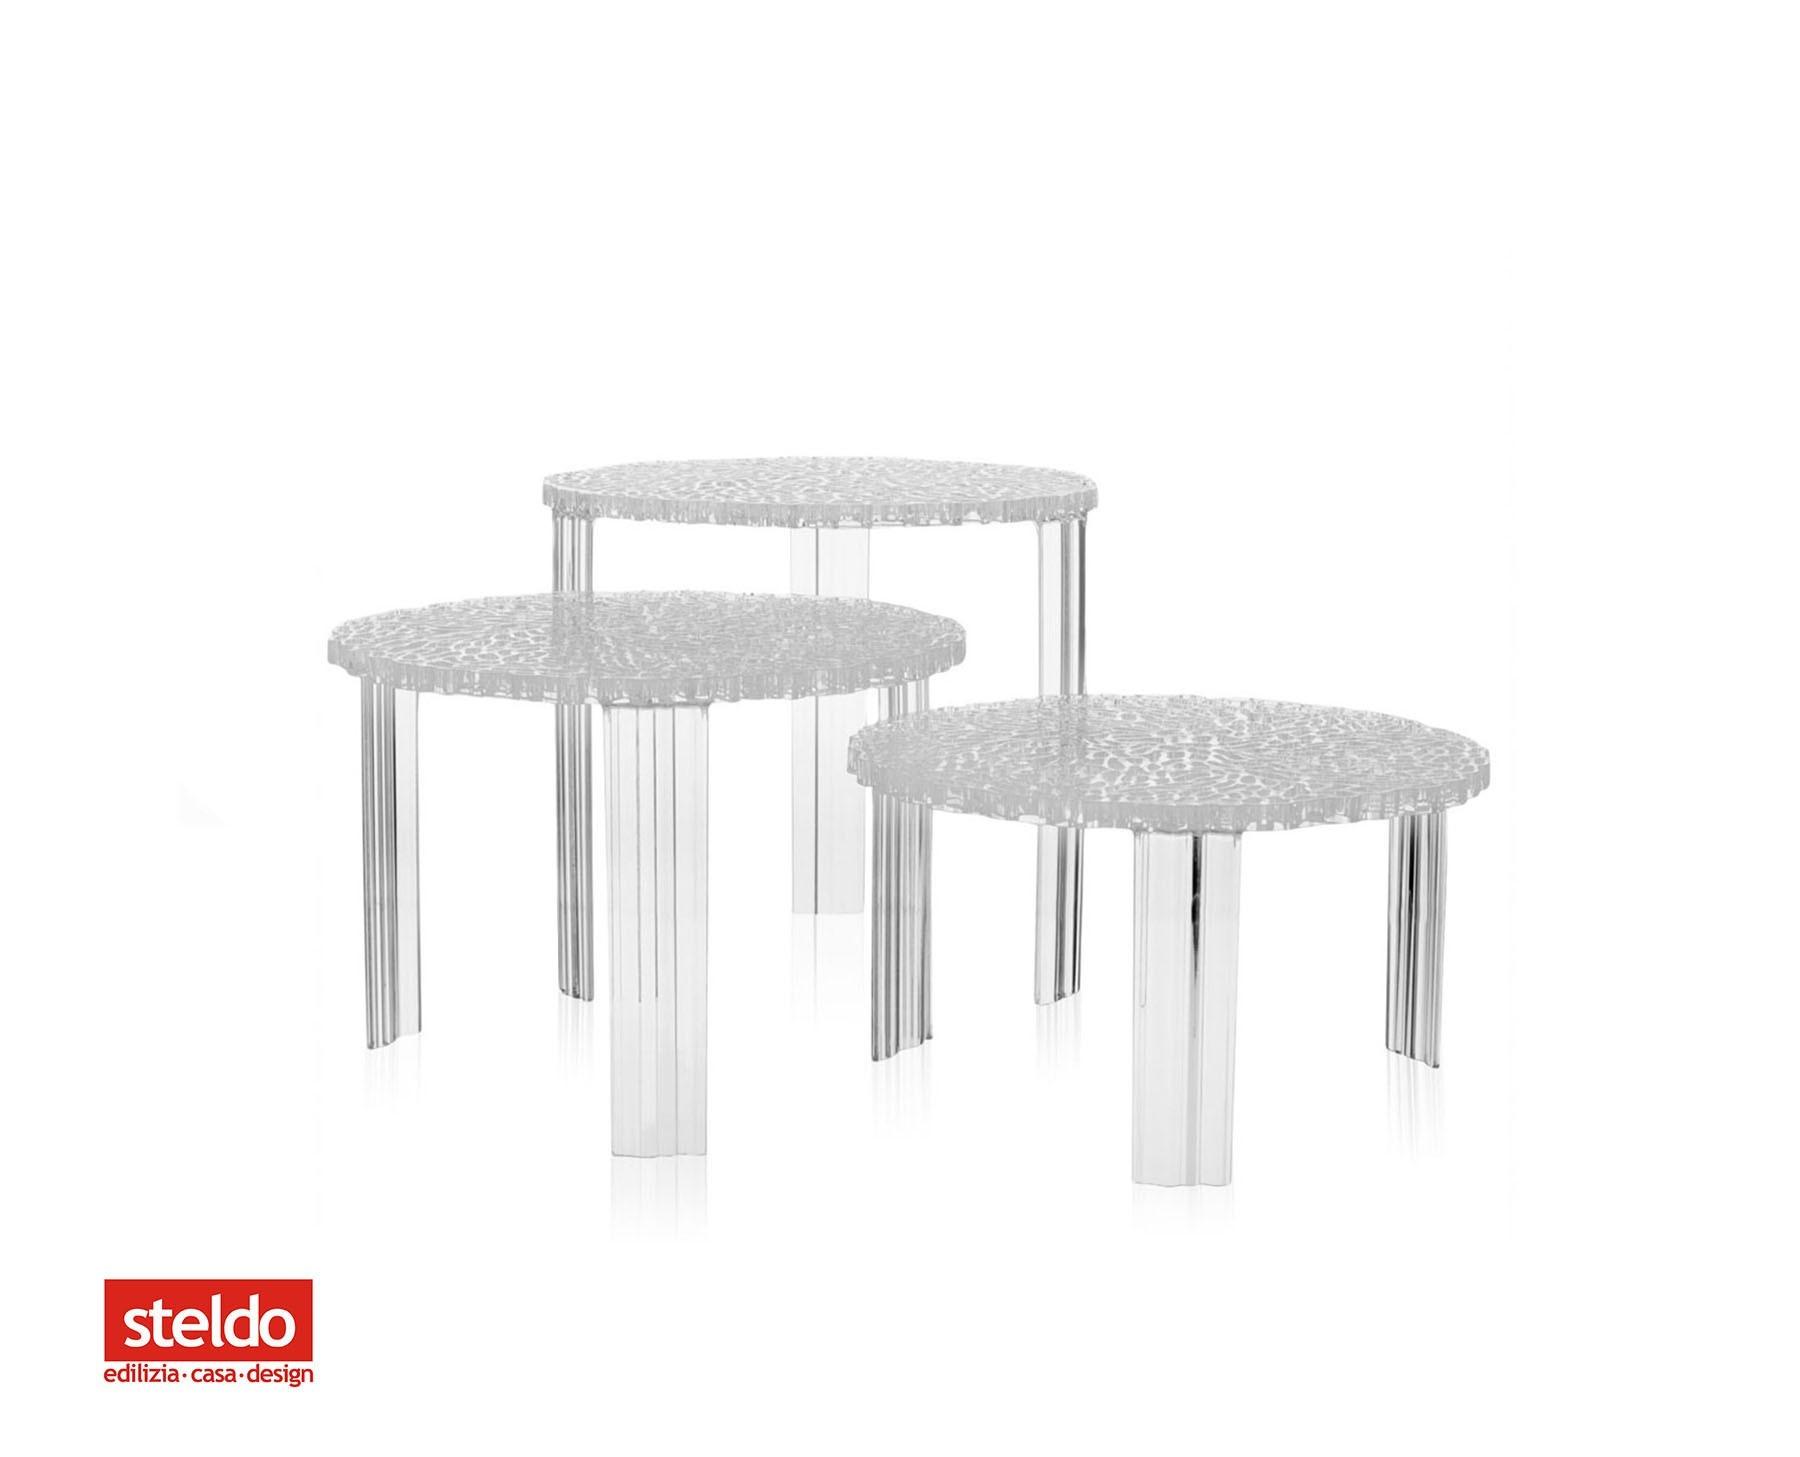 Tavolino kartell t table steldoshop